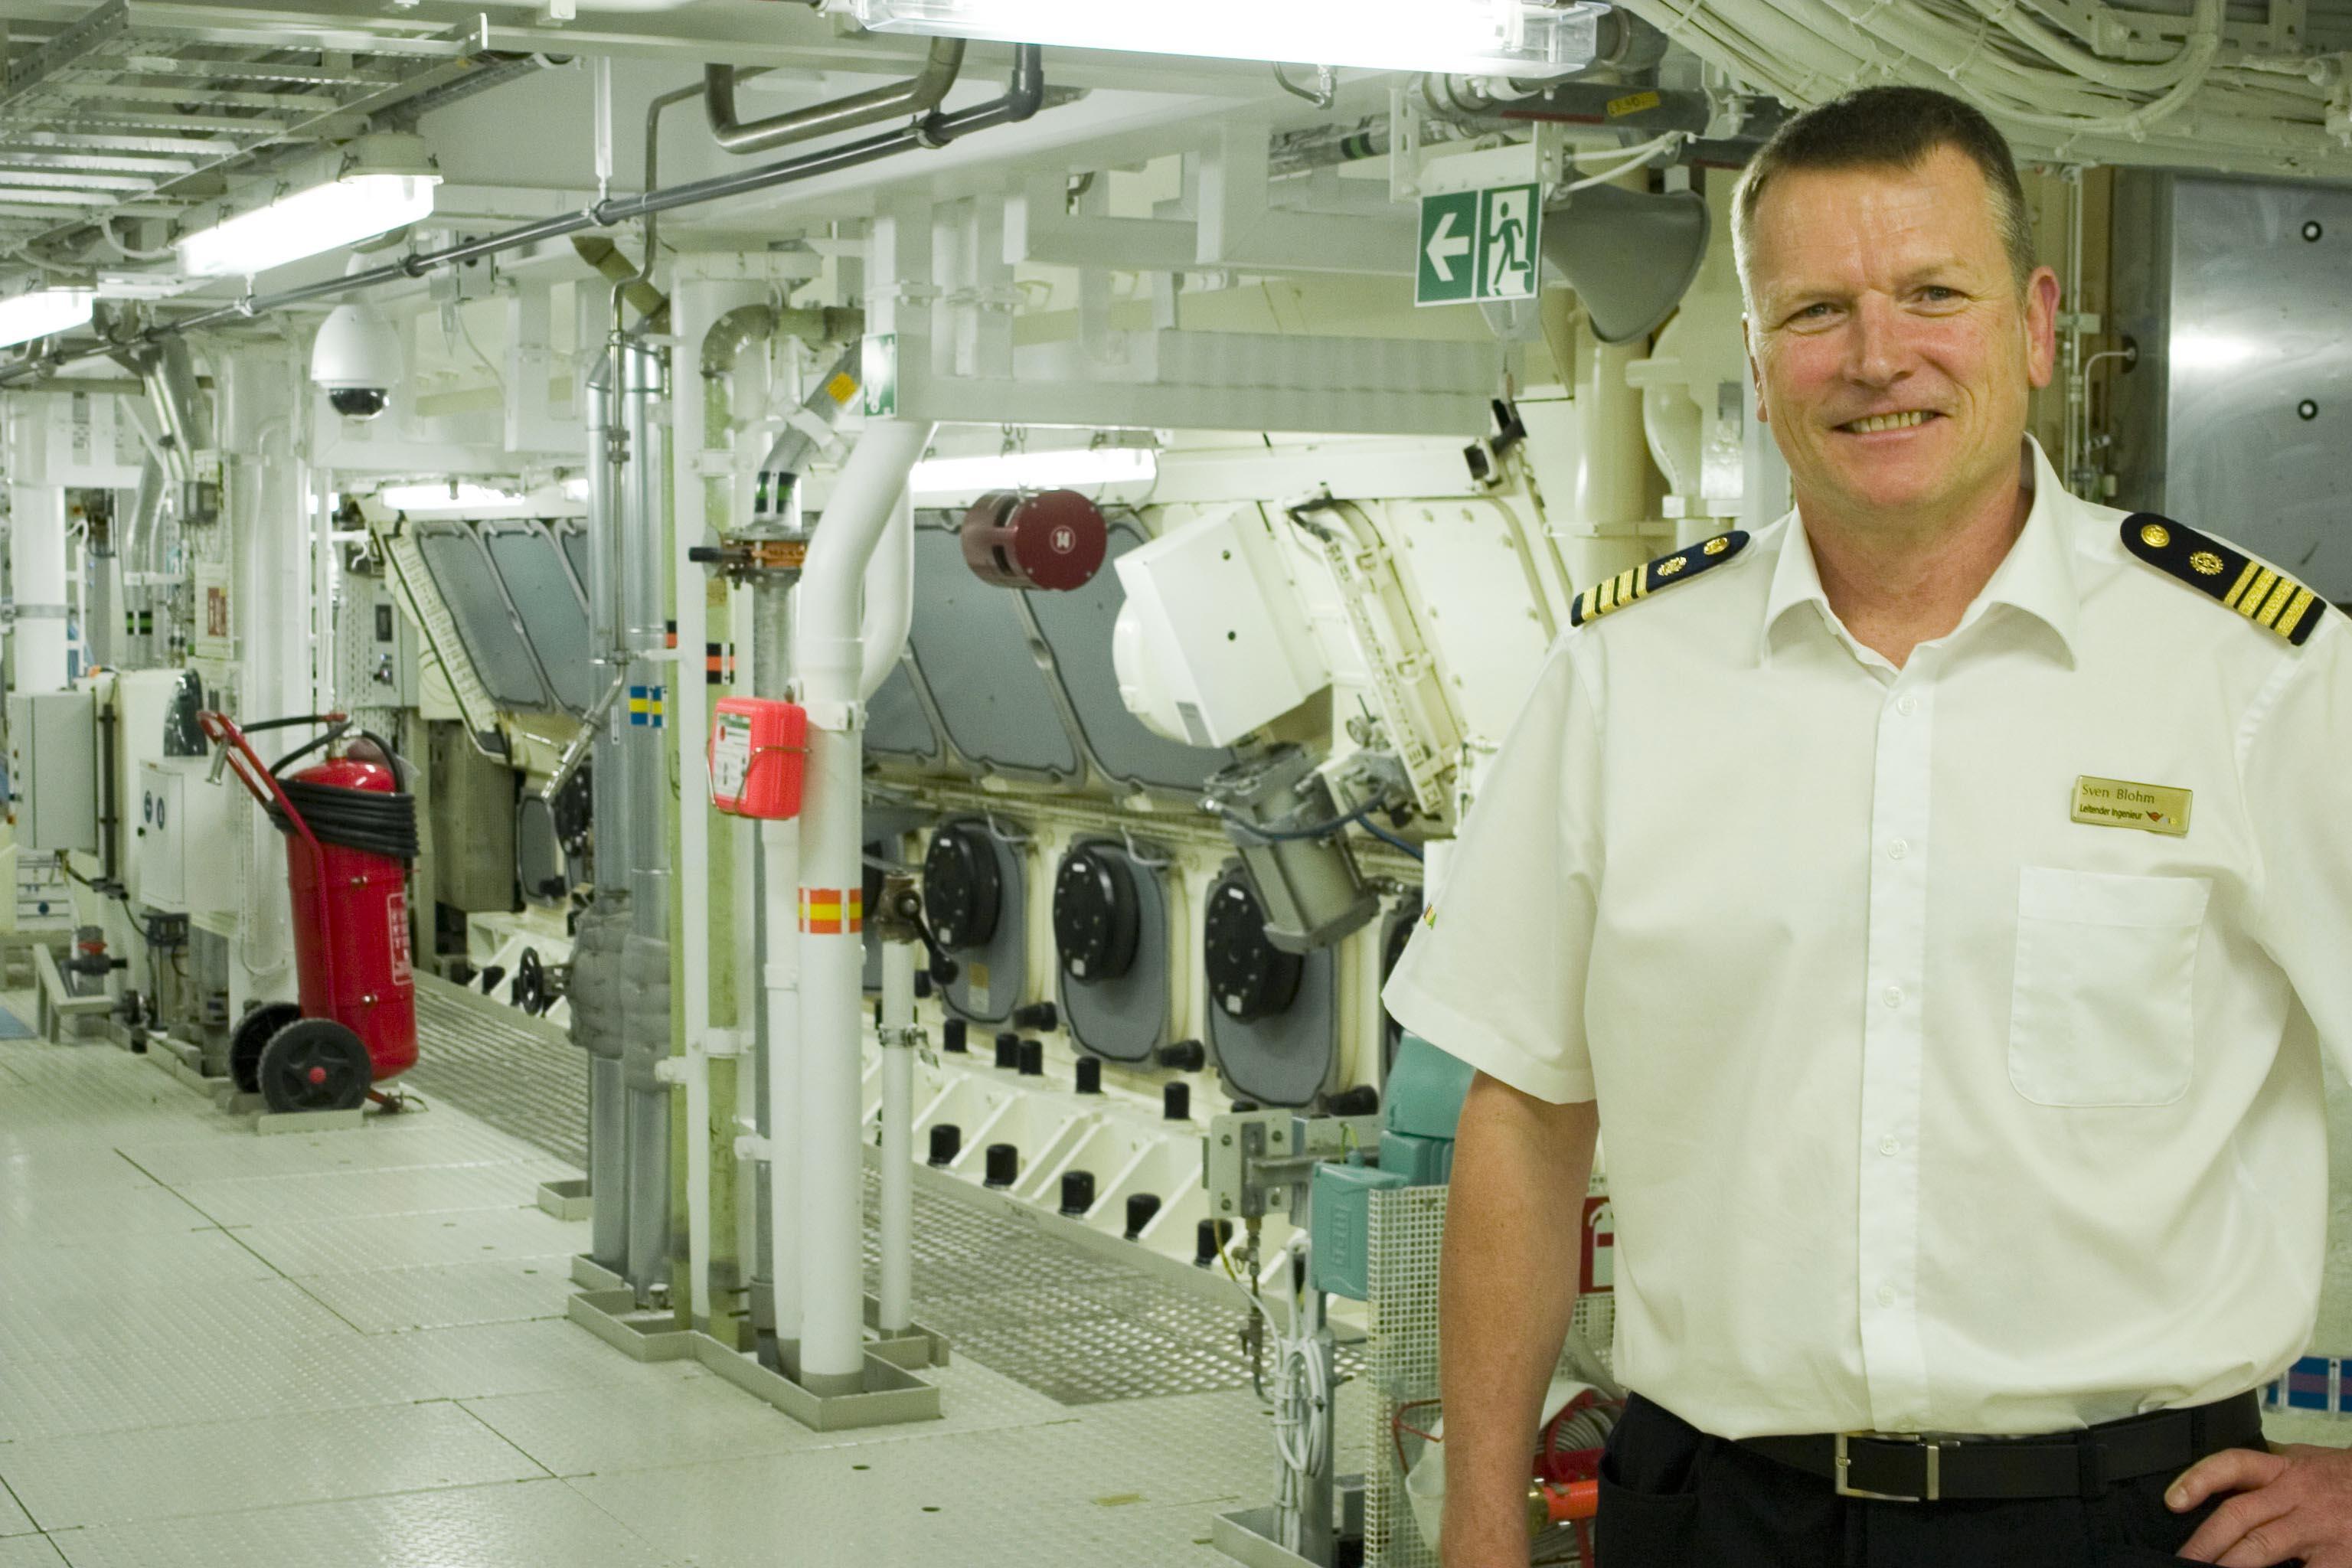 Chefingenieur Sven Blohm im Maschinenraum der AidaNova